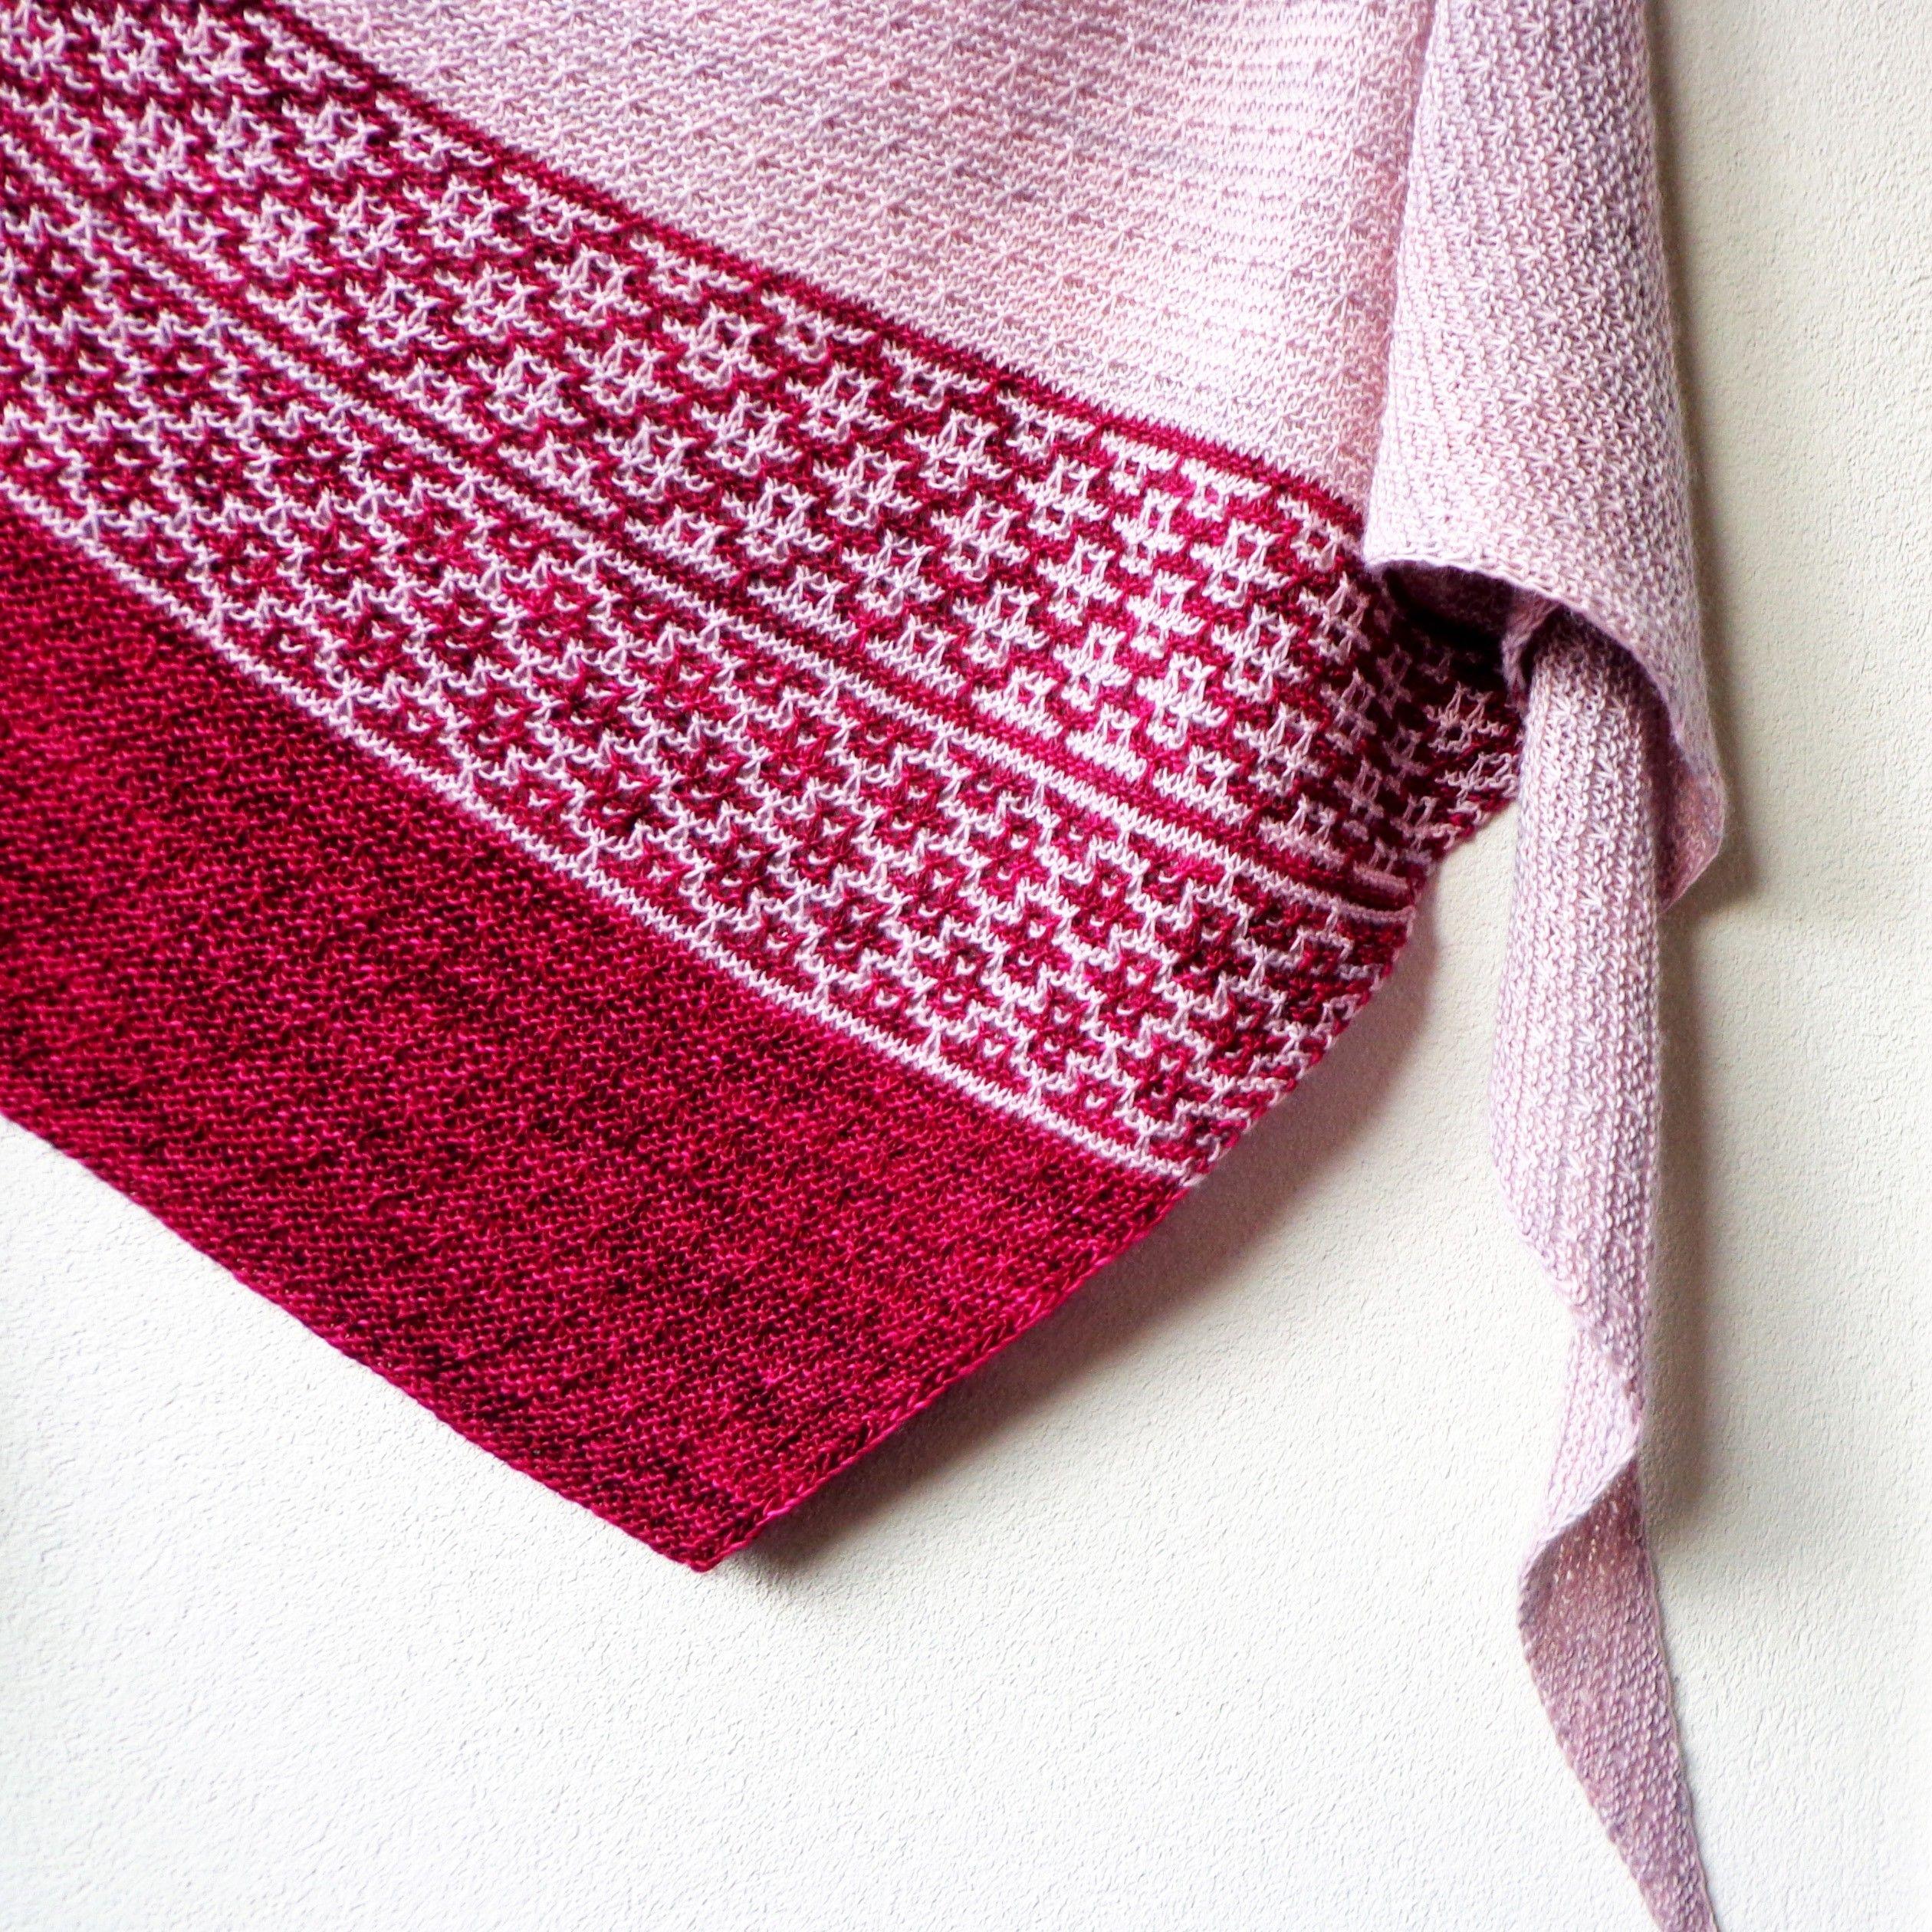 Lisa Hannes Emiliana Shawl Kit In 2020 Plastic Crochet Hook Colorwork Knitting Shawl Knitting Patterns